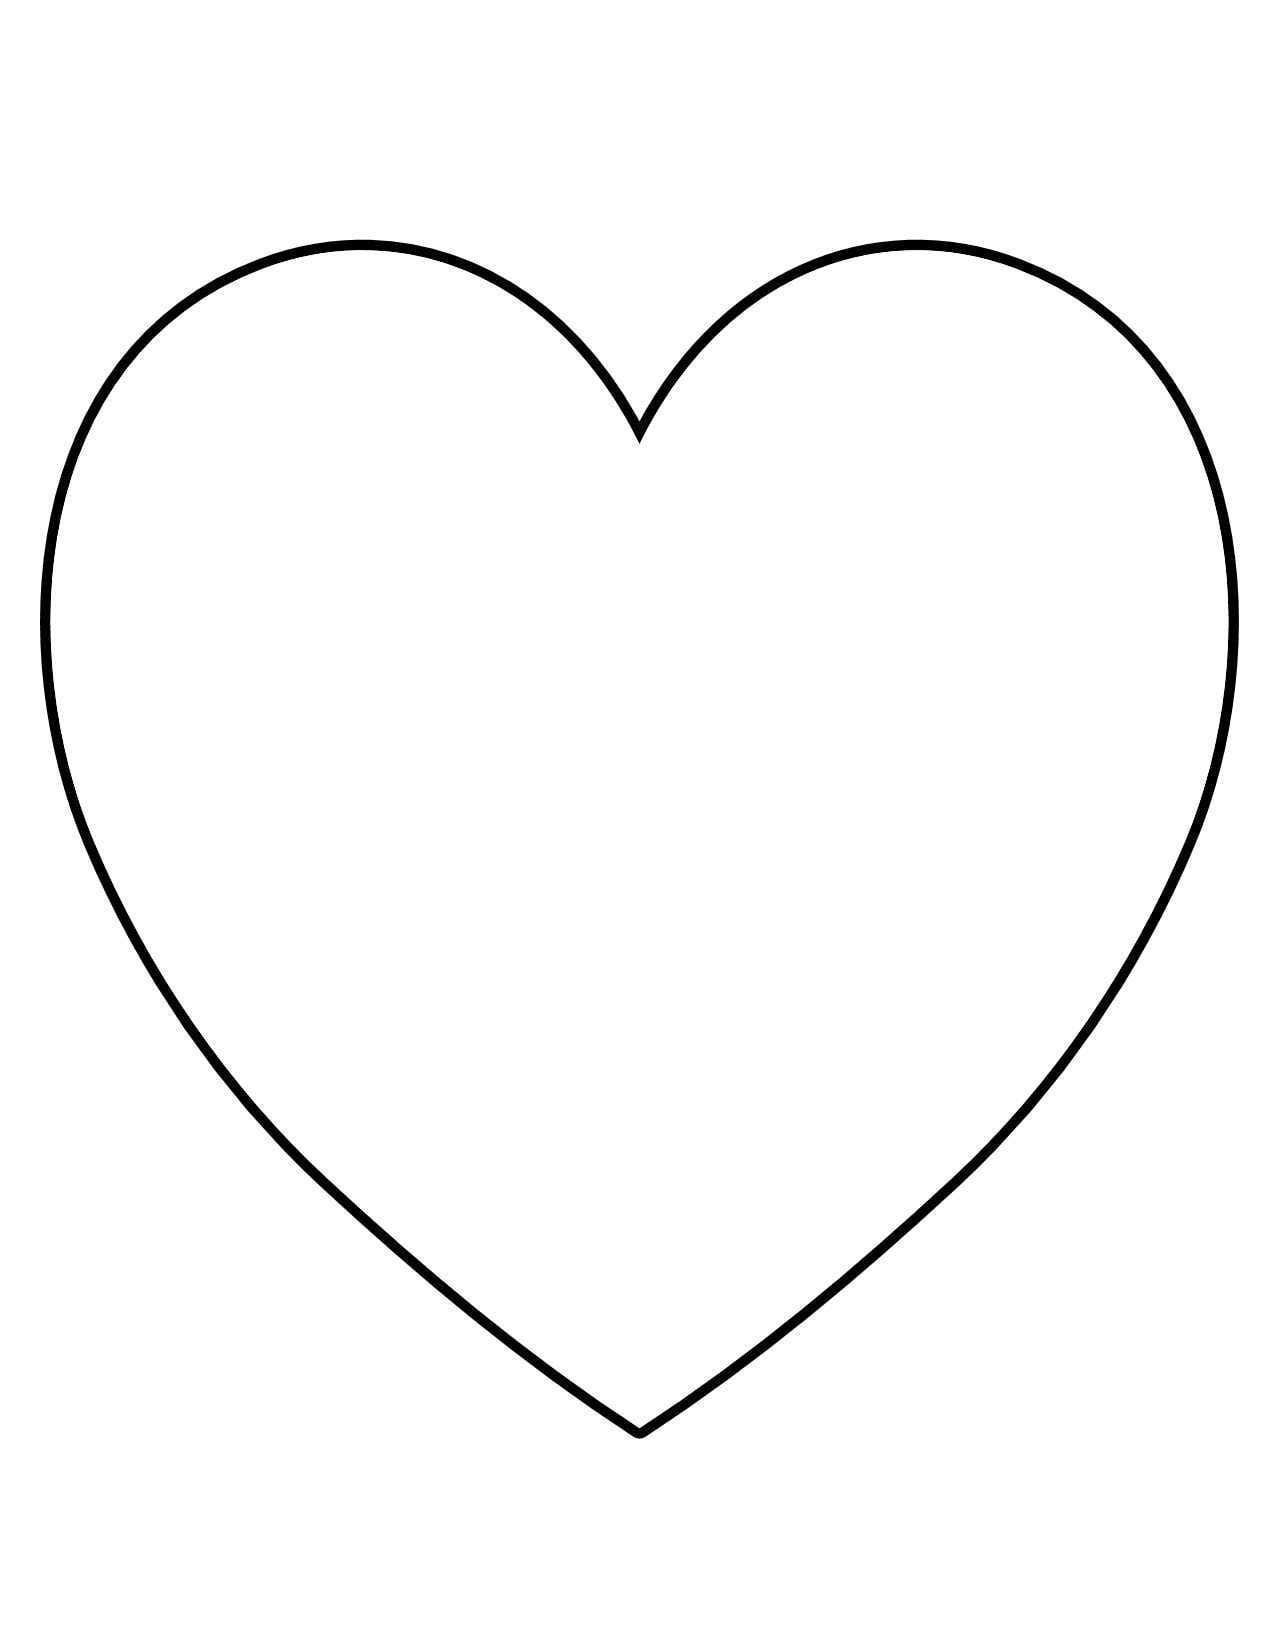 Printable Heart Shape Template